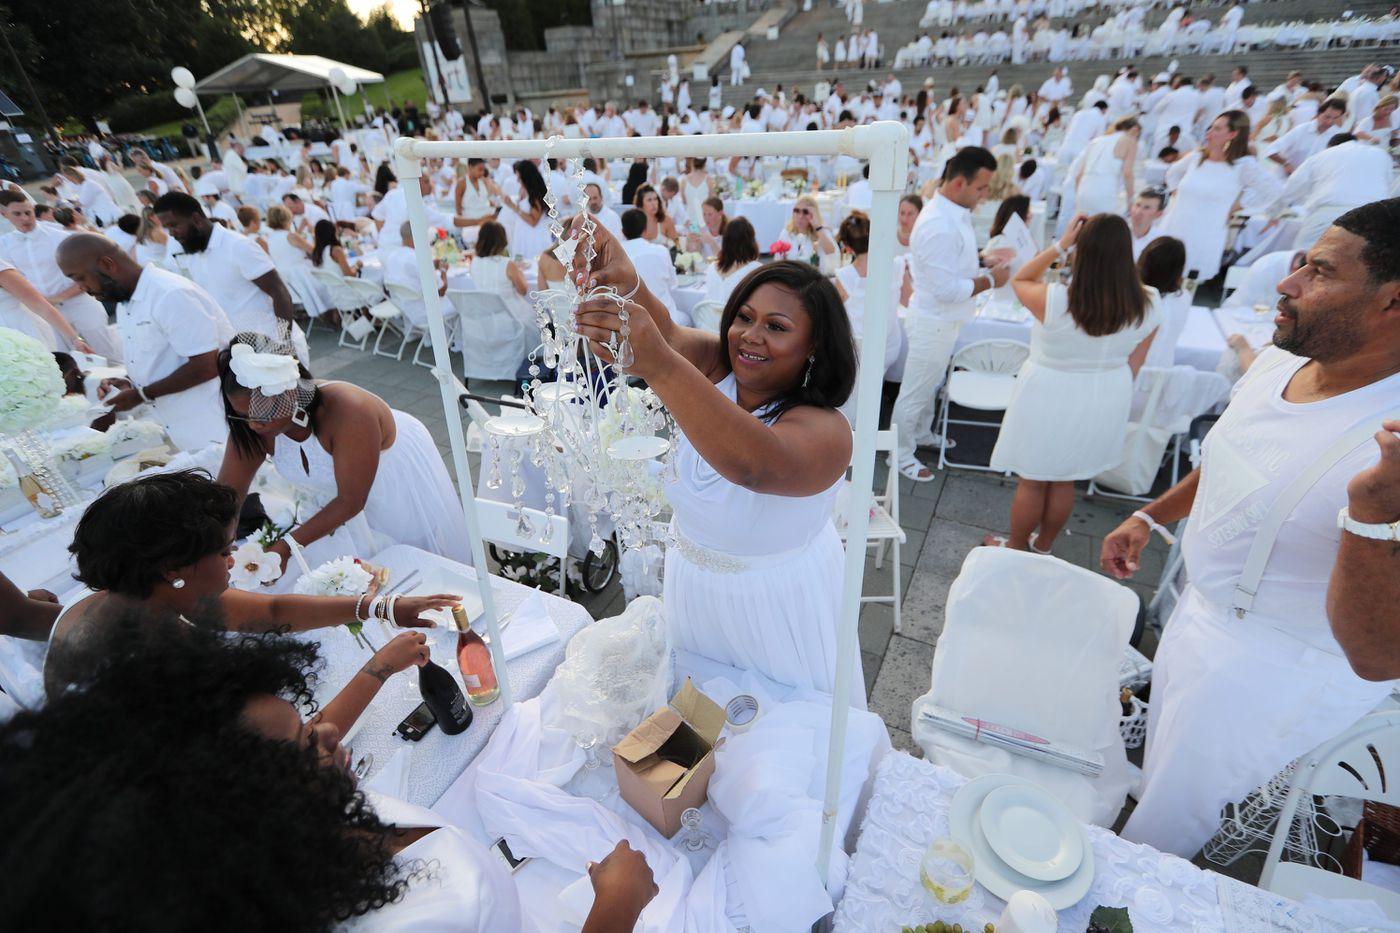 Win a ticket to Diner en Blanc | Let's Eat